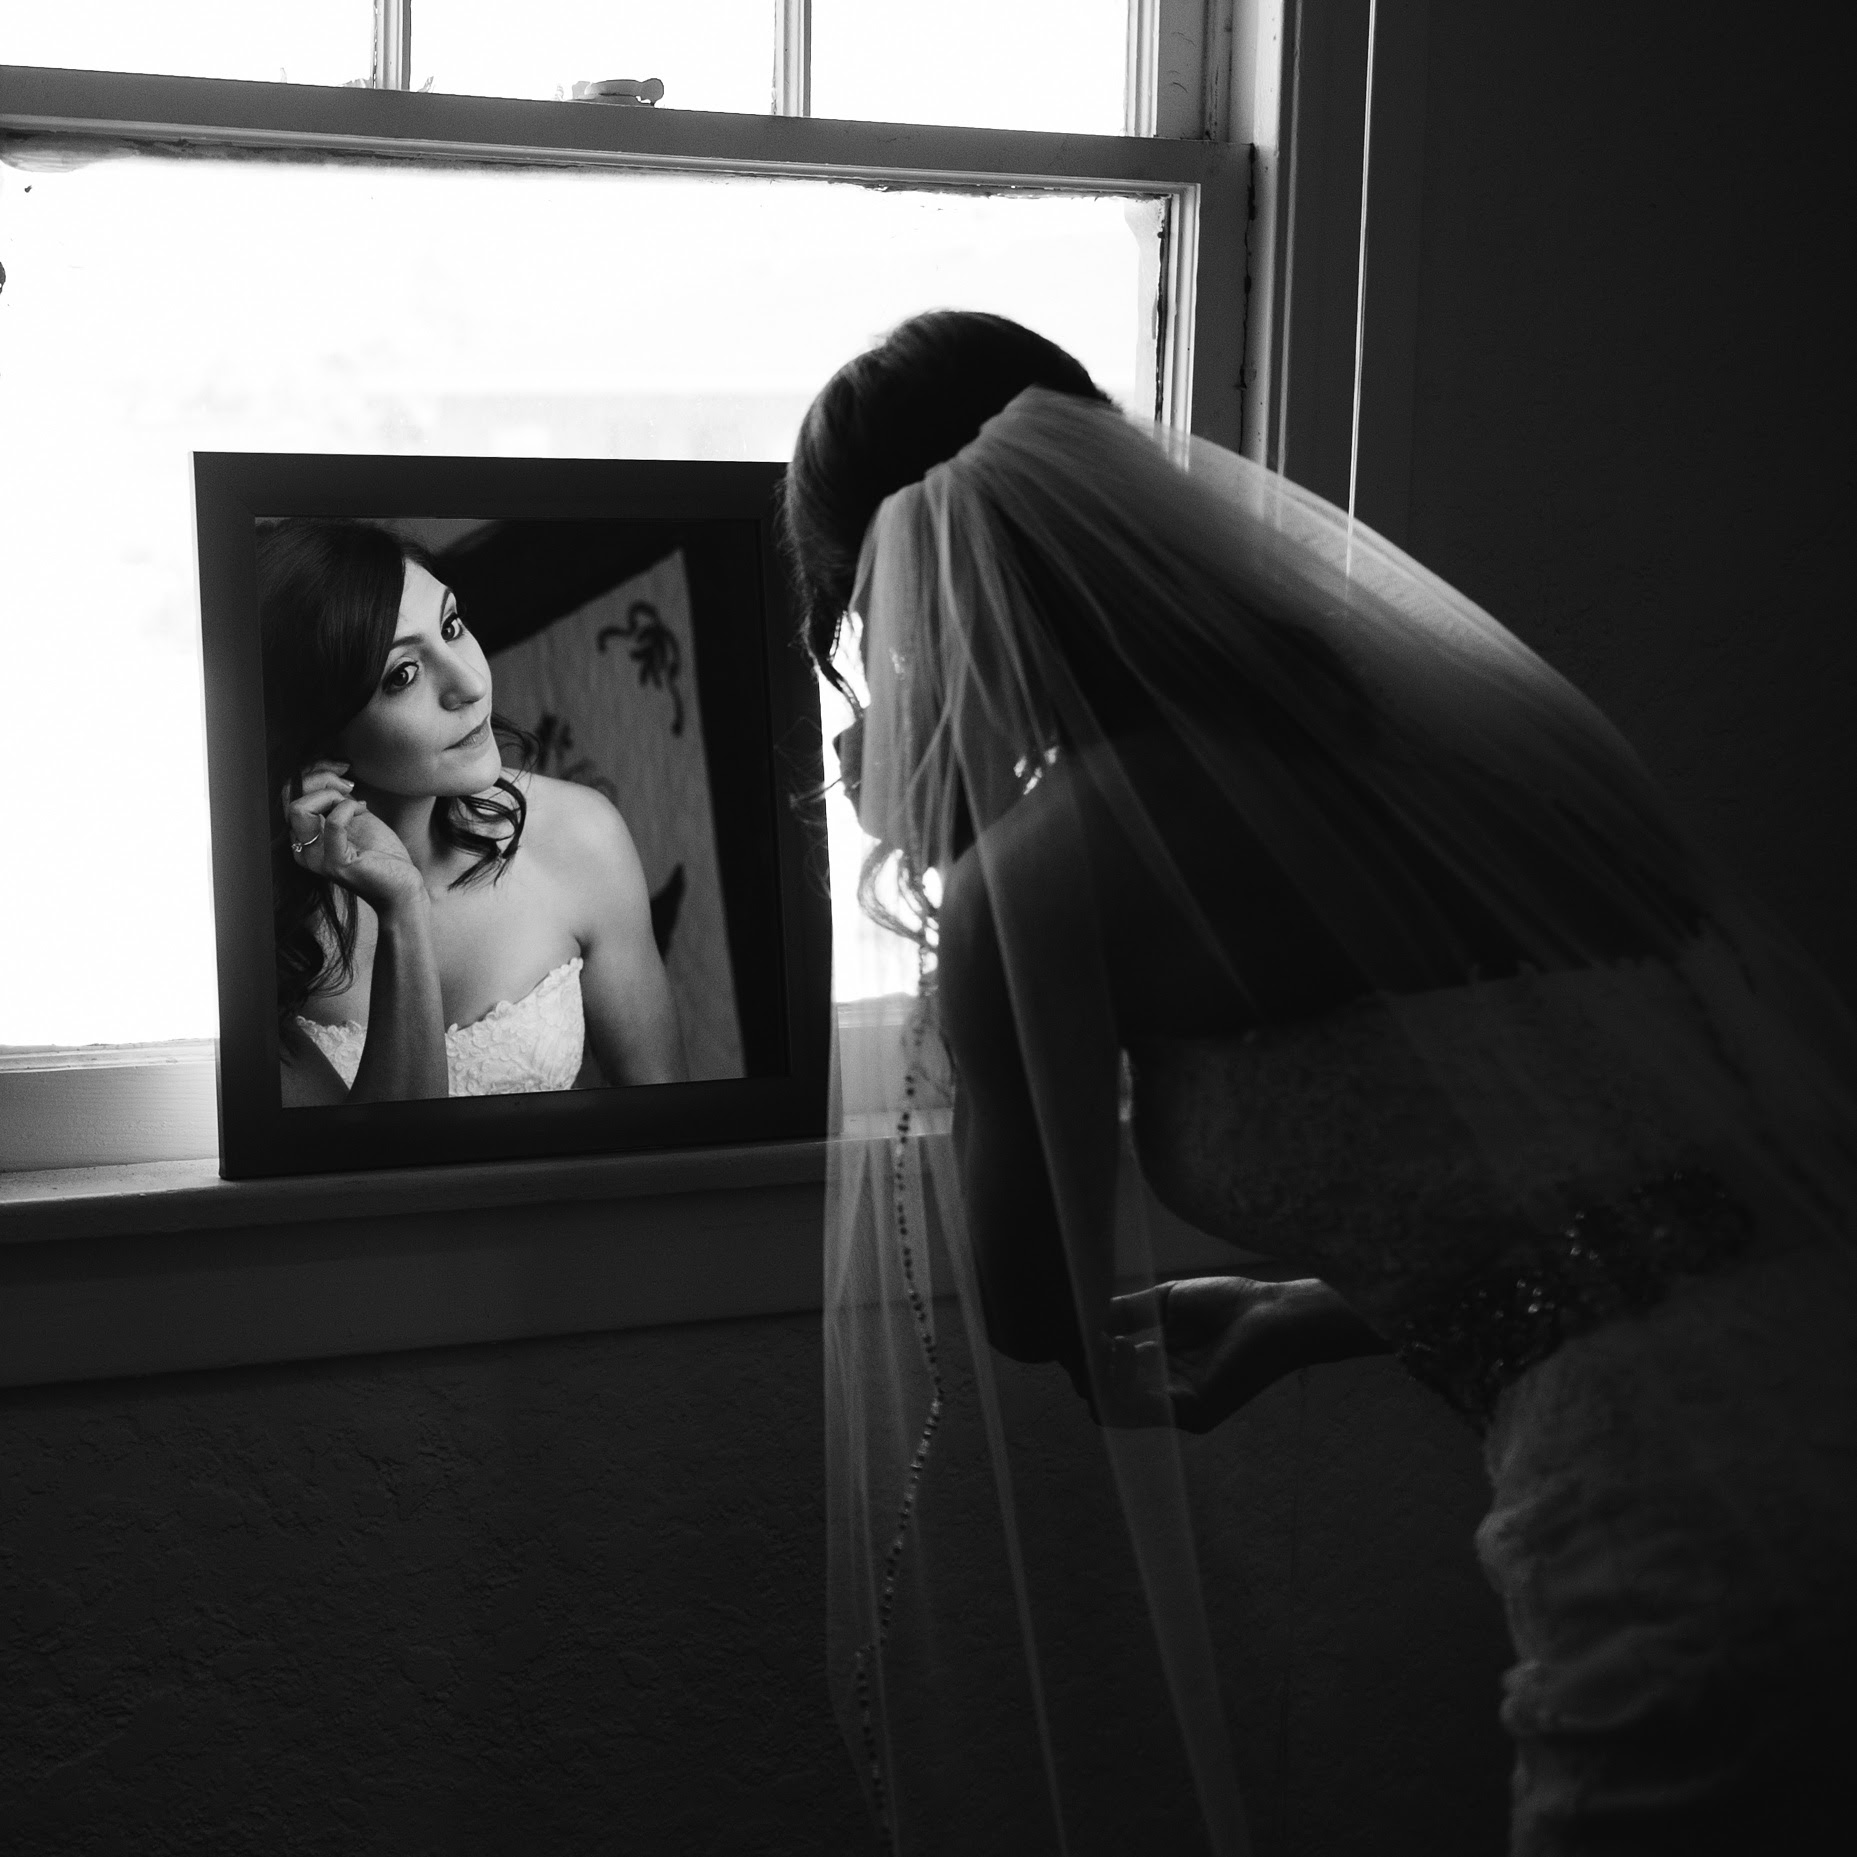 photo by Leo Cabal